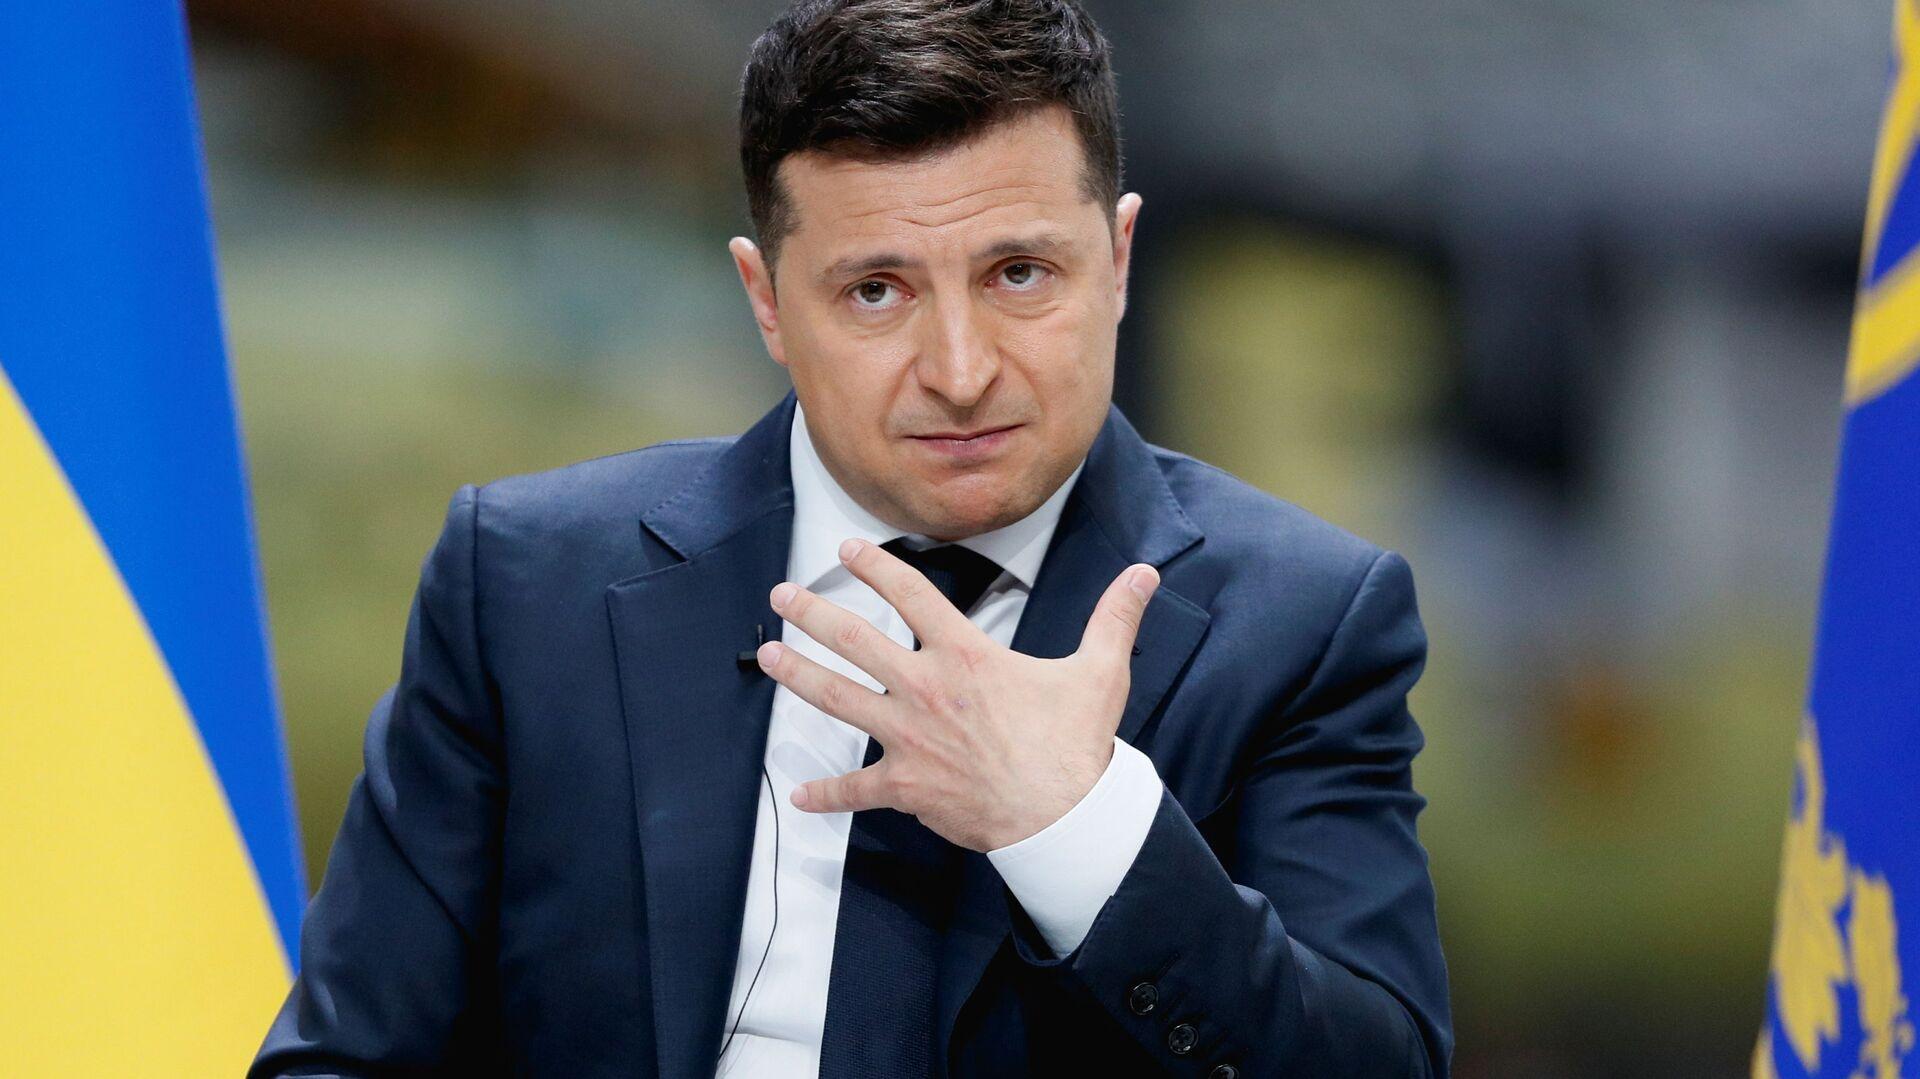 Predsednik Ukrajine Vladimir Zelenski - Sputnik Srbija, 1920, 03.08.2021